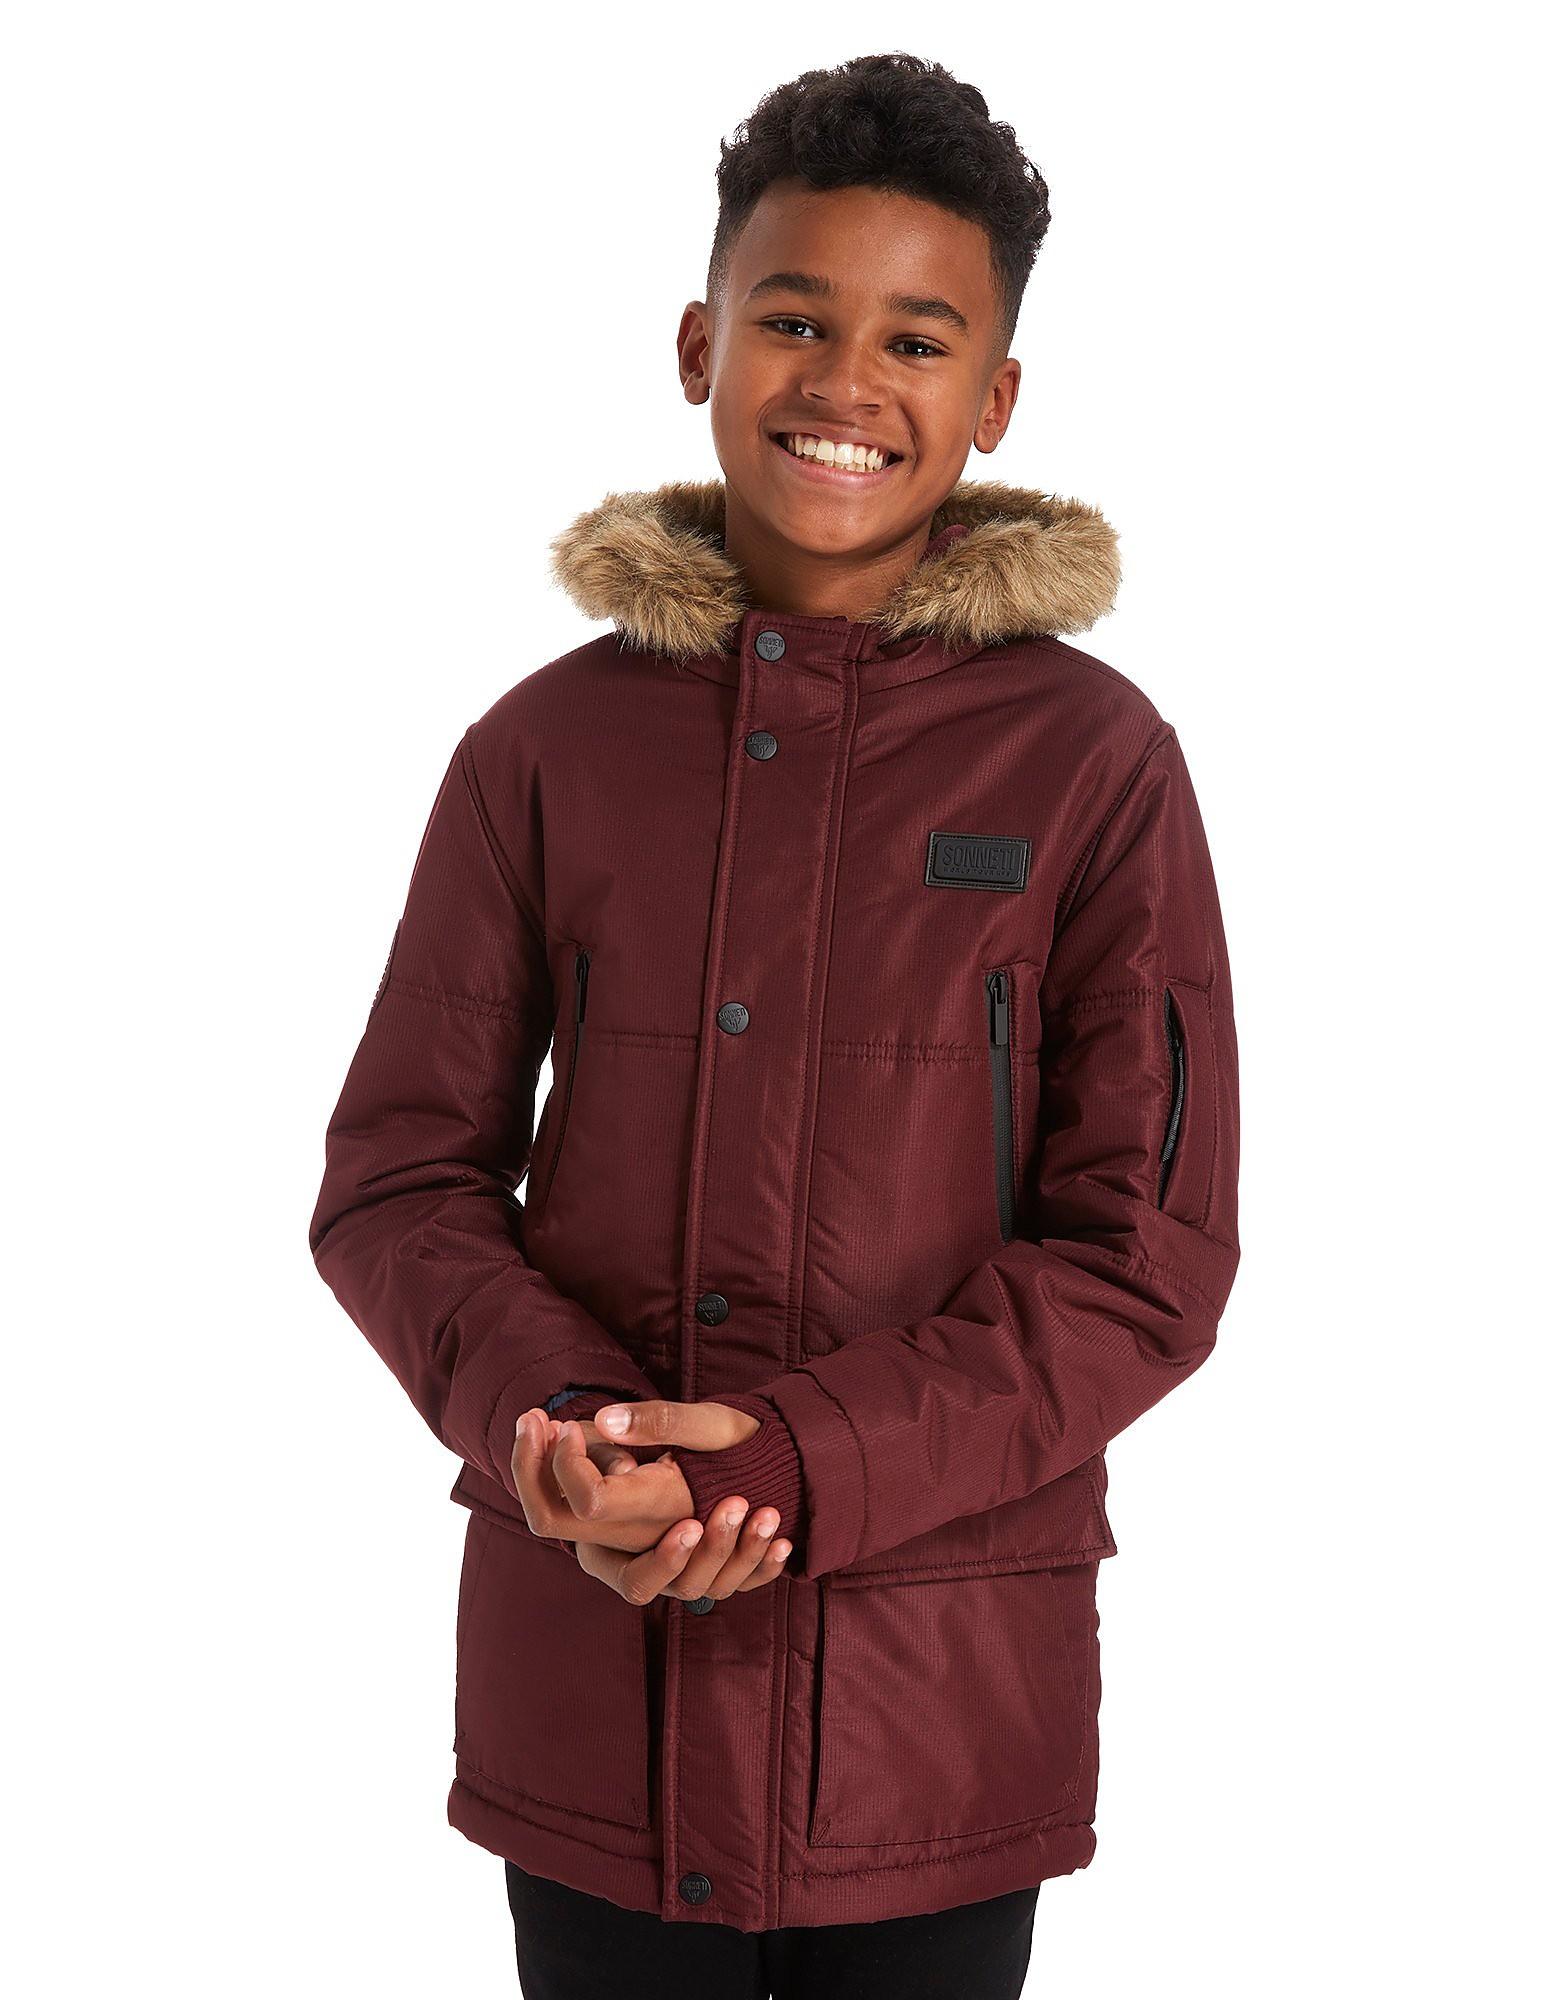 Sonneti Command Jacket Junior